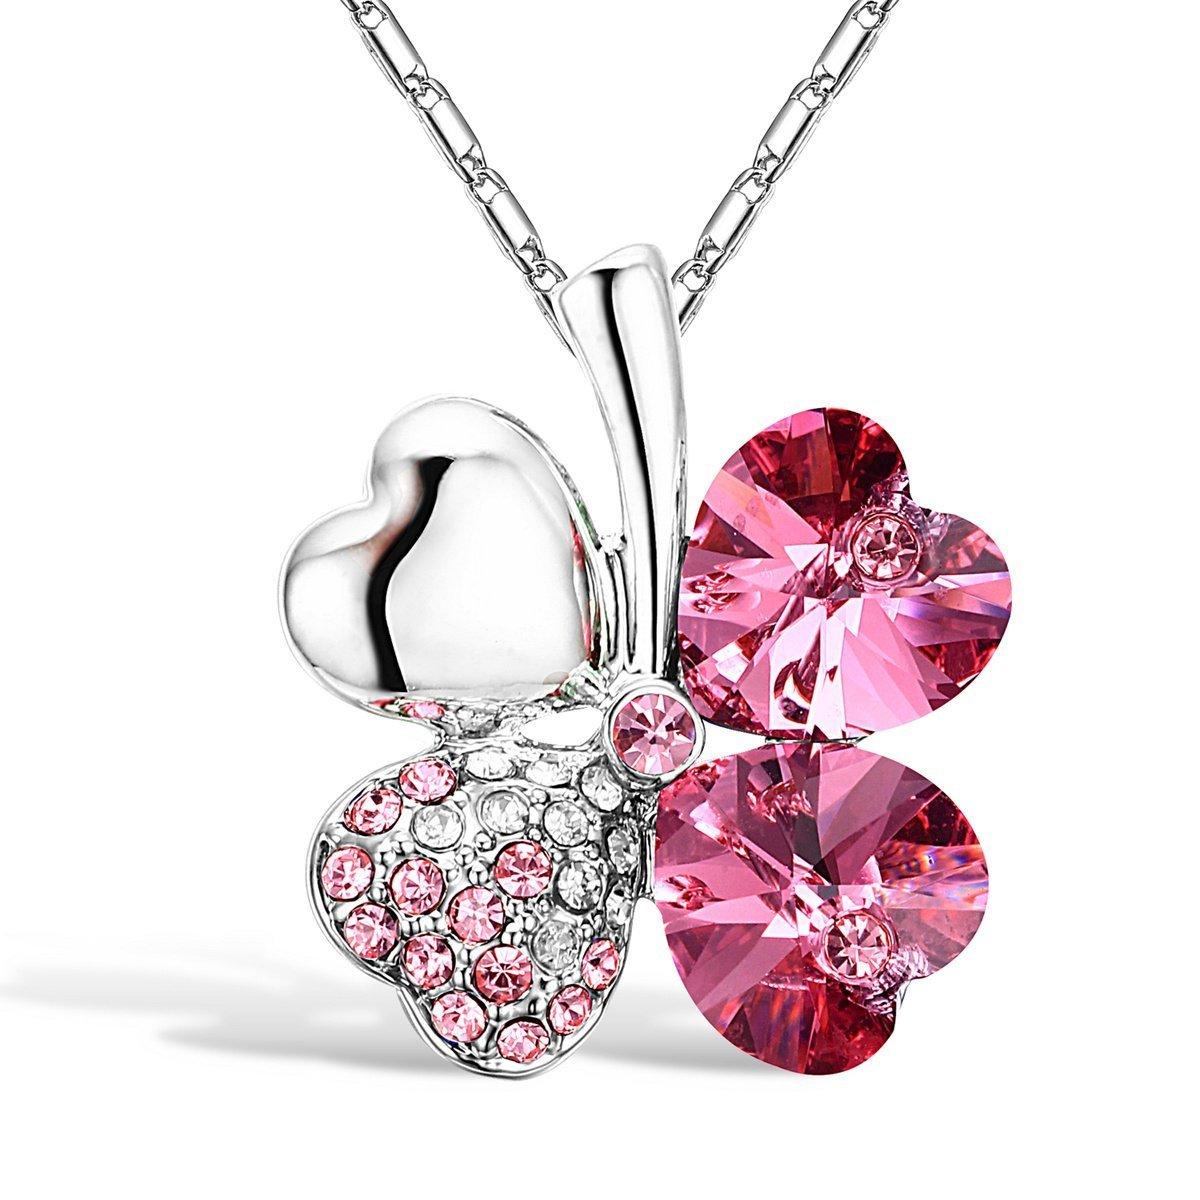 Leaf Clover Heart Shaped Crystal Pendant Necklace